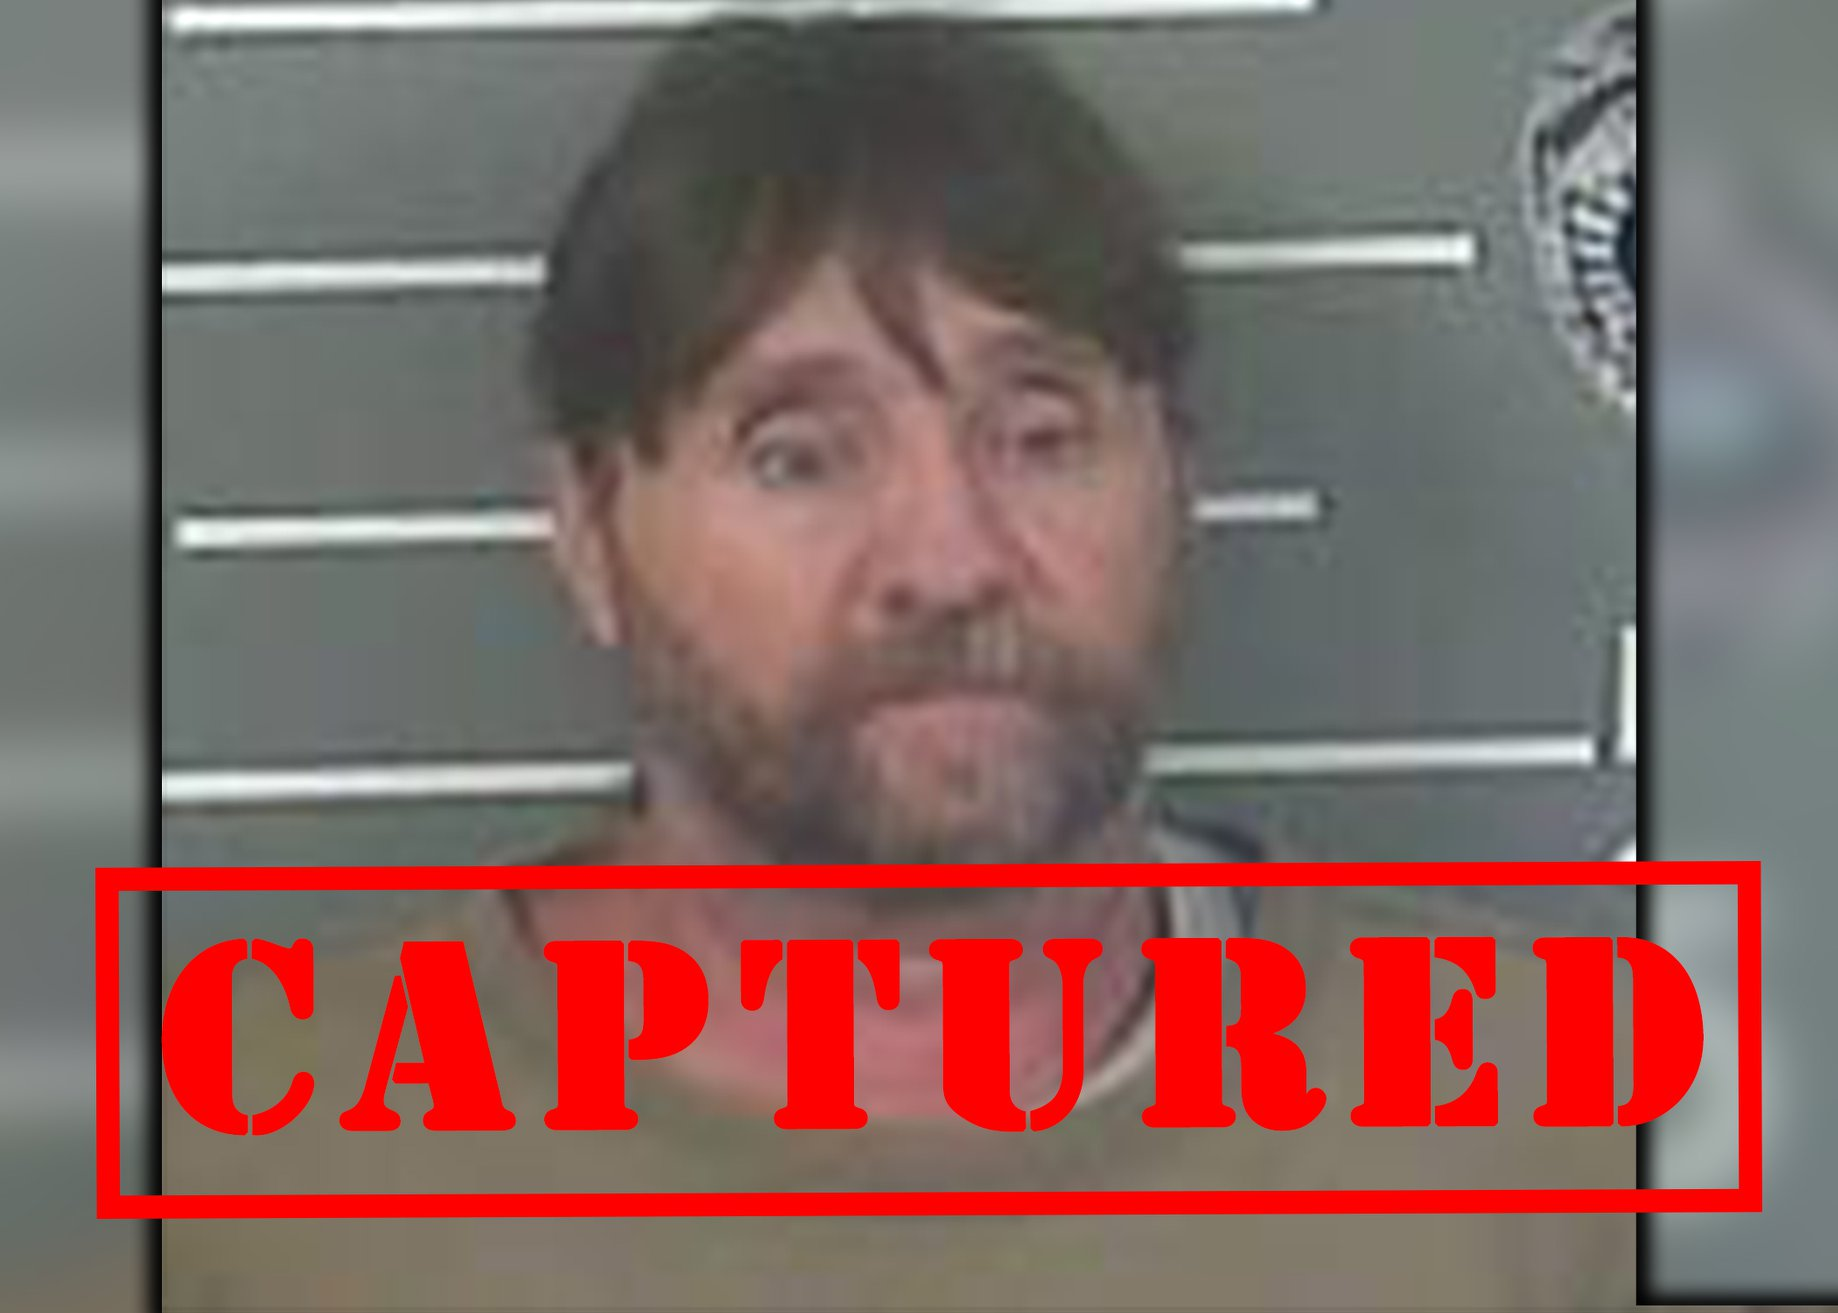 ksp fifth suspect in officer shooting_1521133657254.jpg.jpg